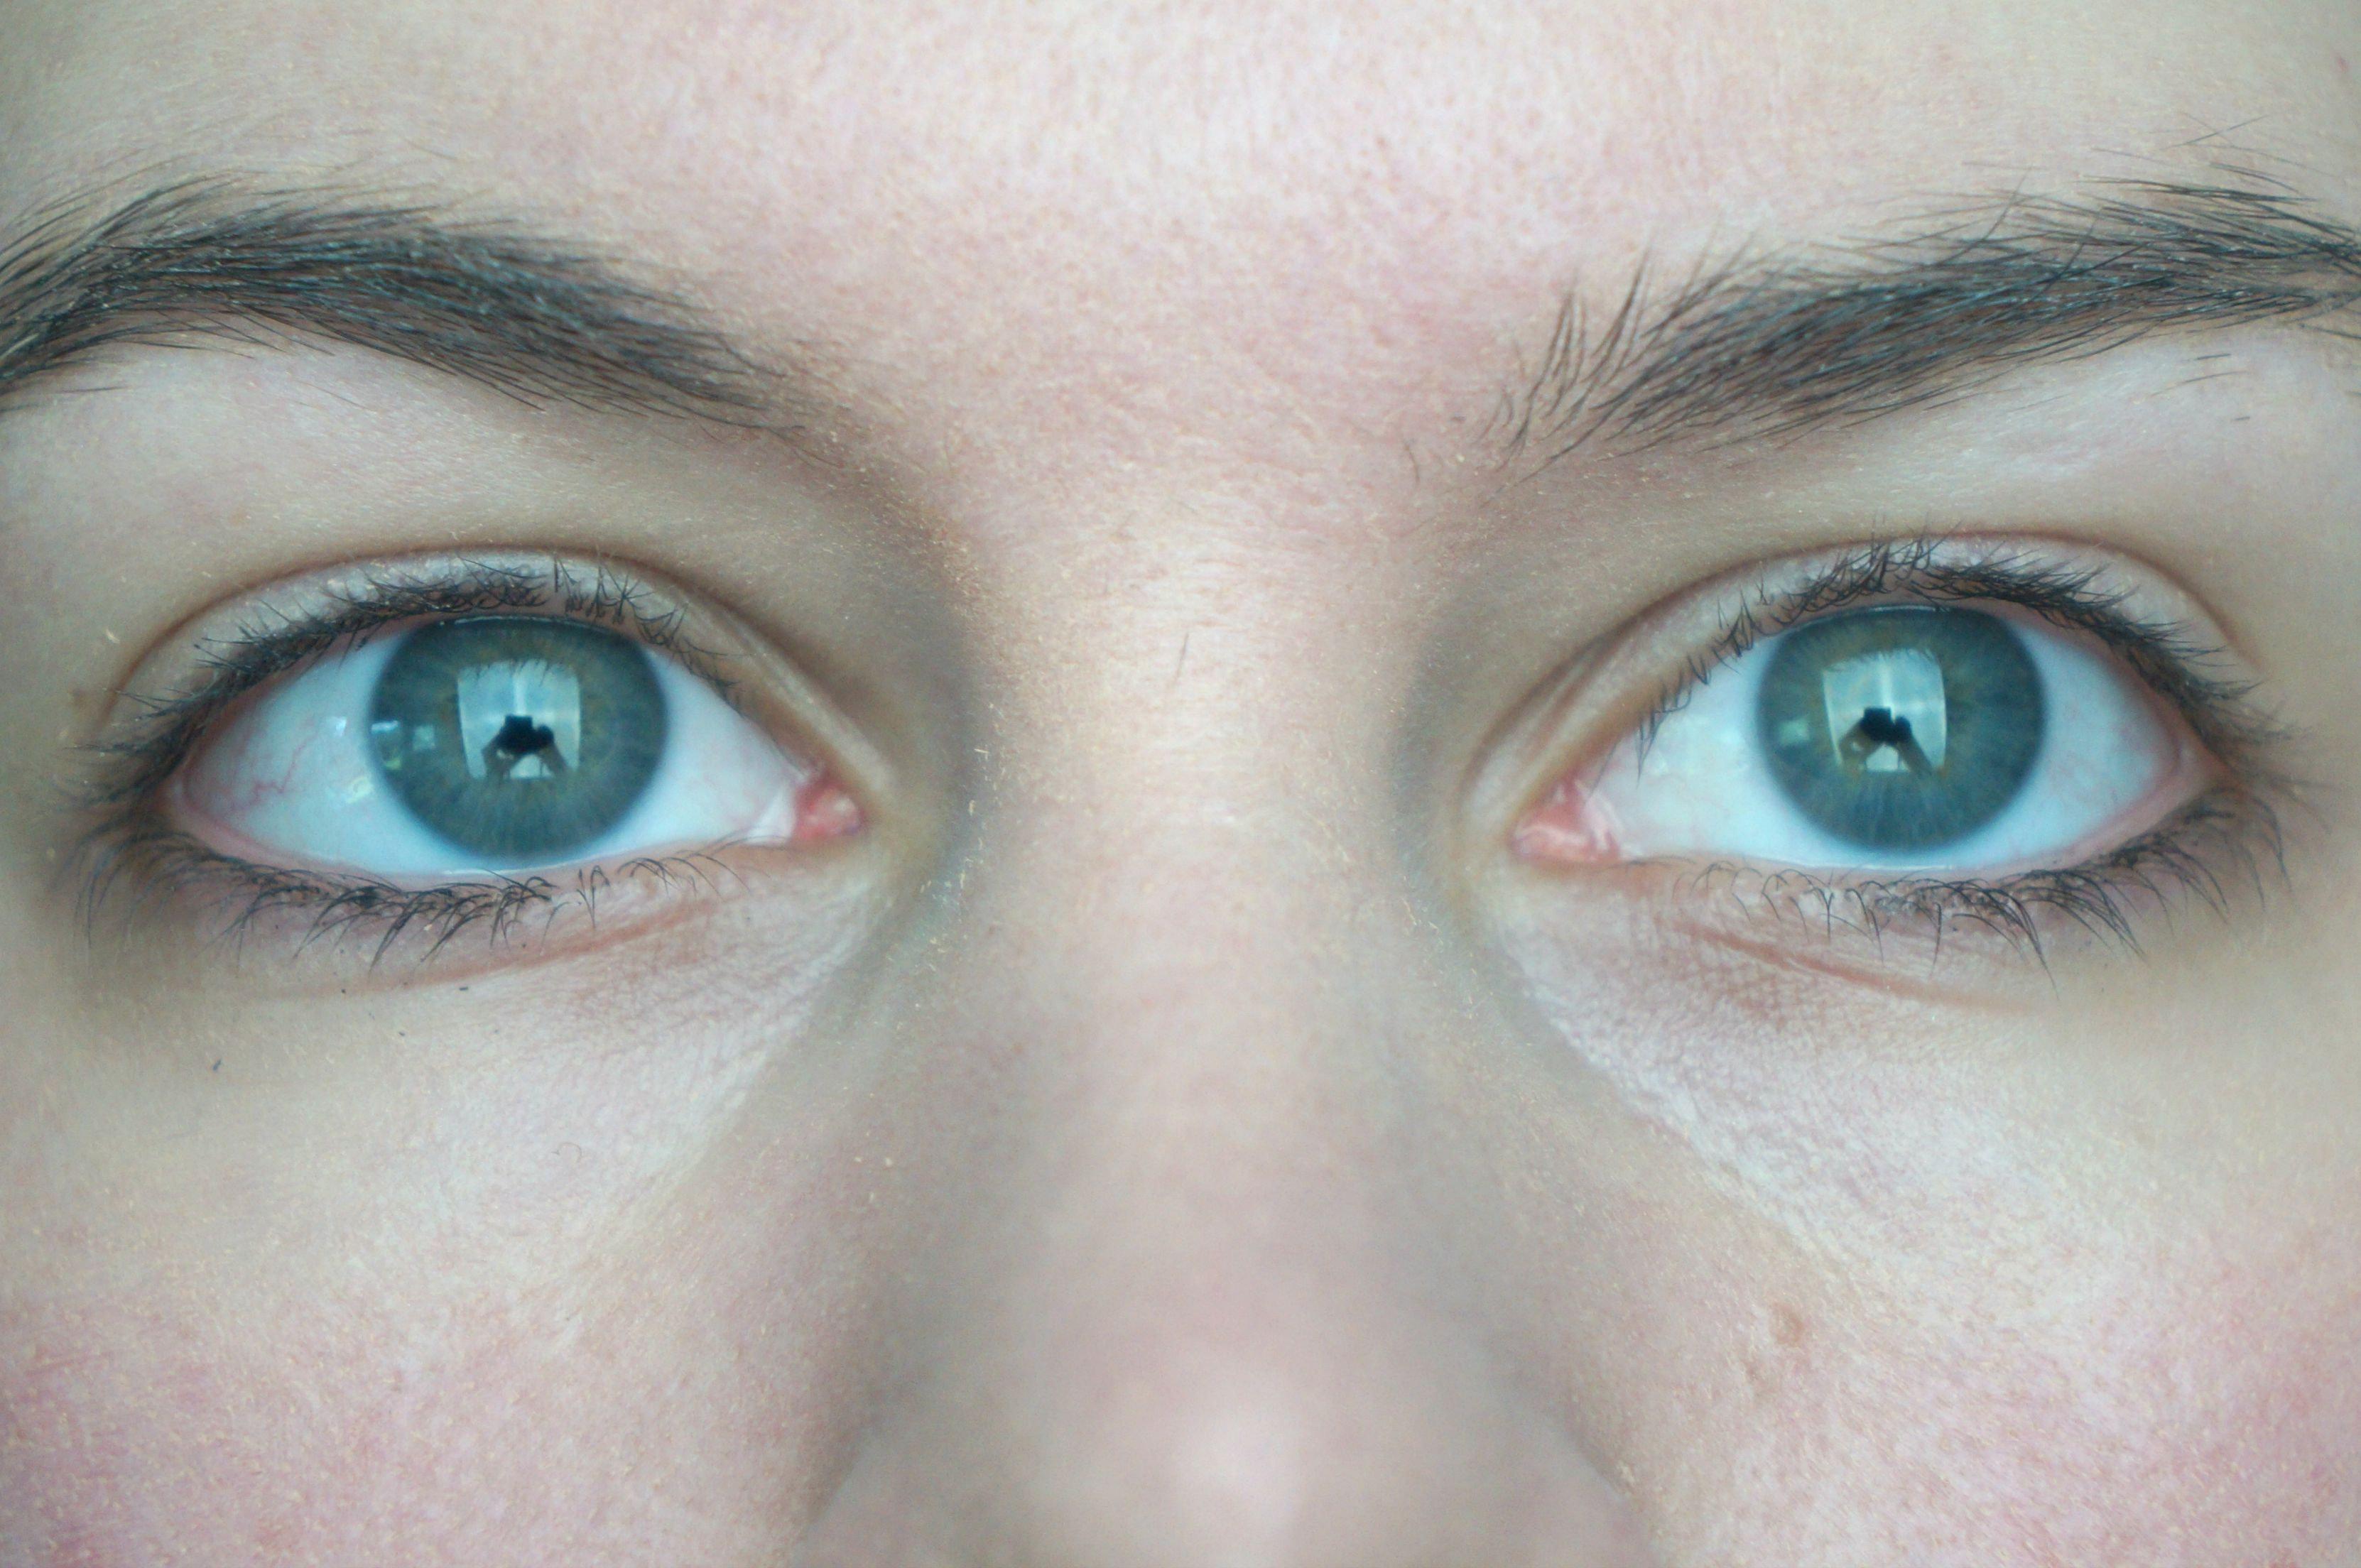 Tweezerman Promaster Lash Curler For Deep Set Hooded Eyes Is Your